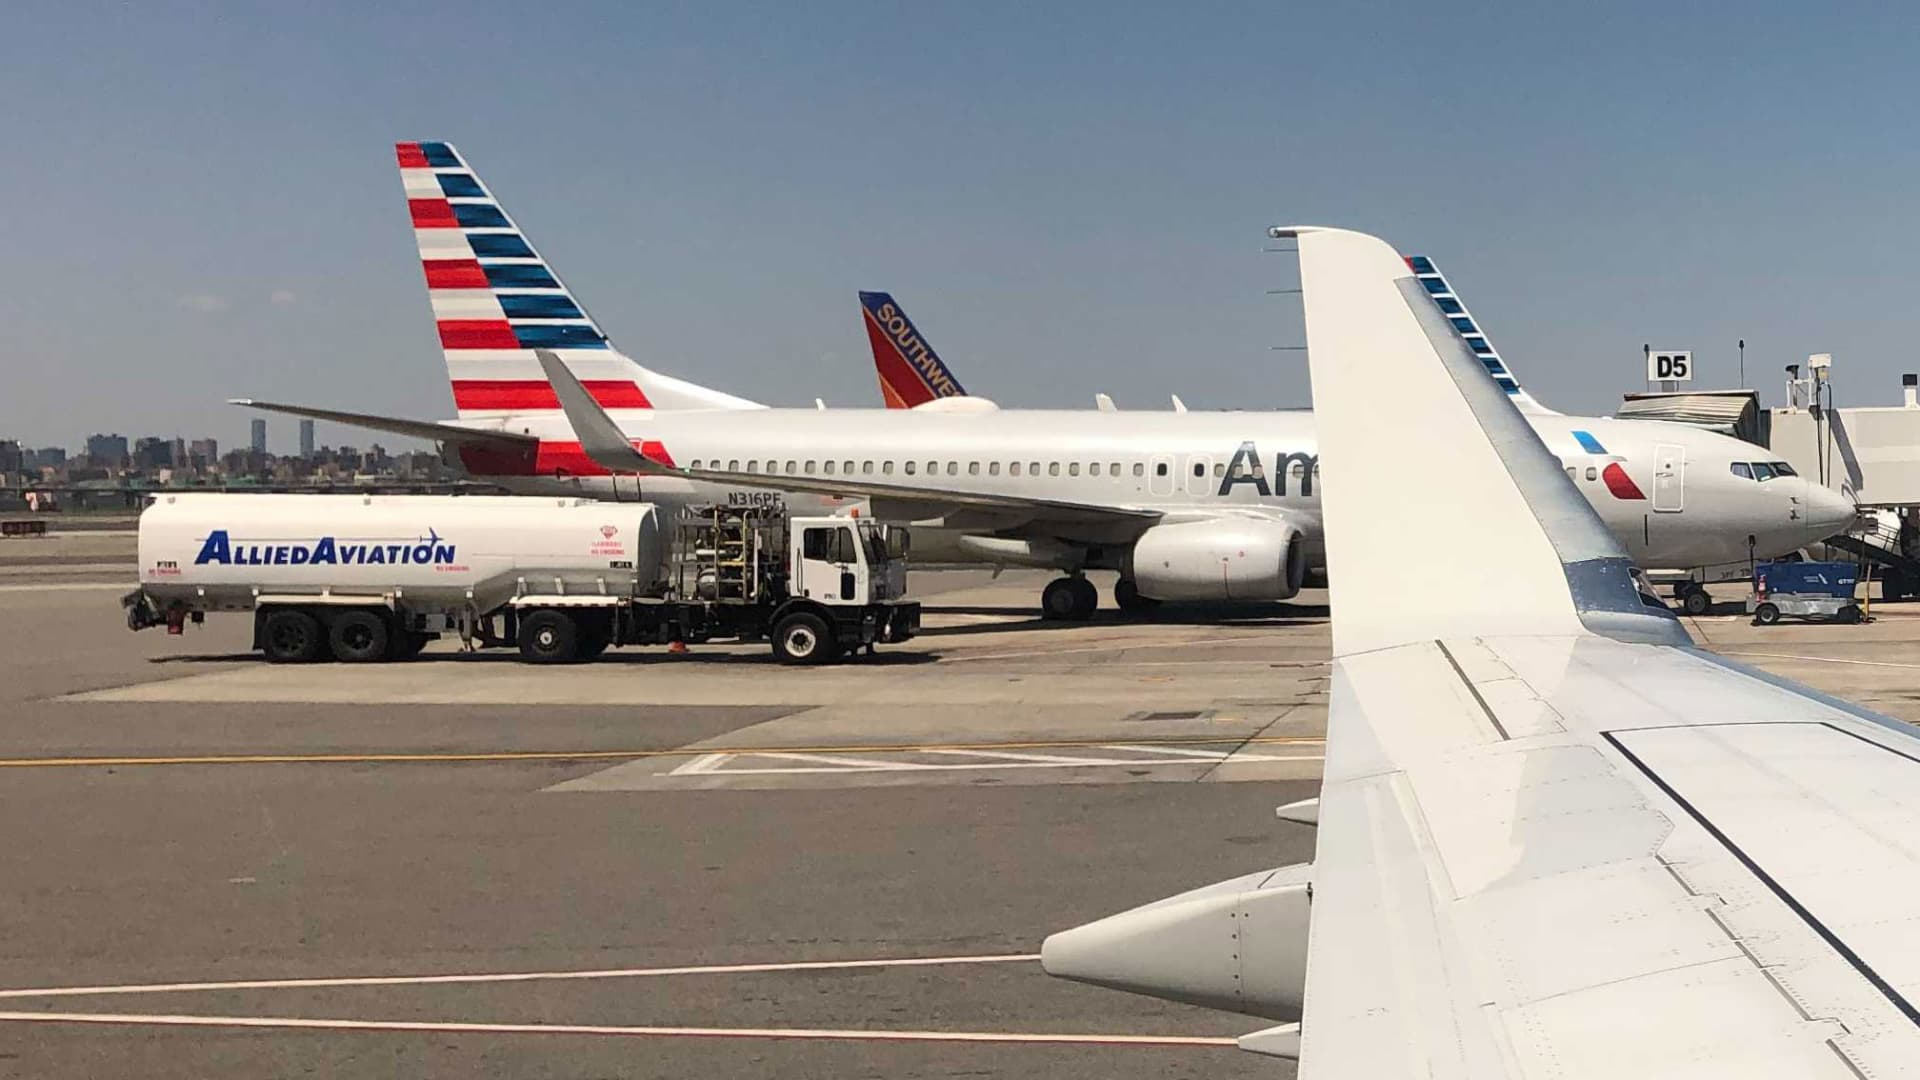 American Airlines planes at LaGuardia Airport